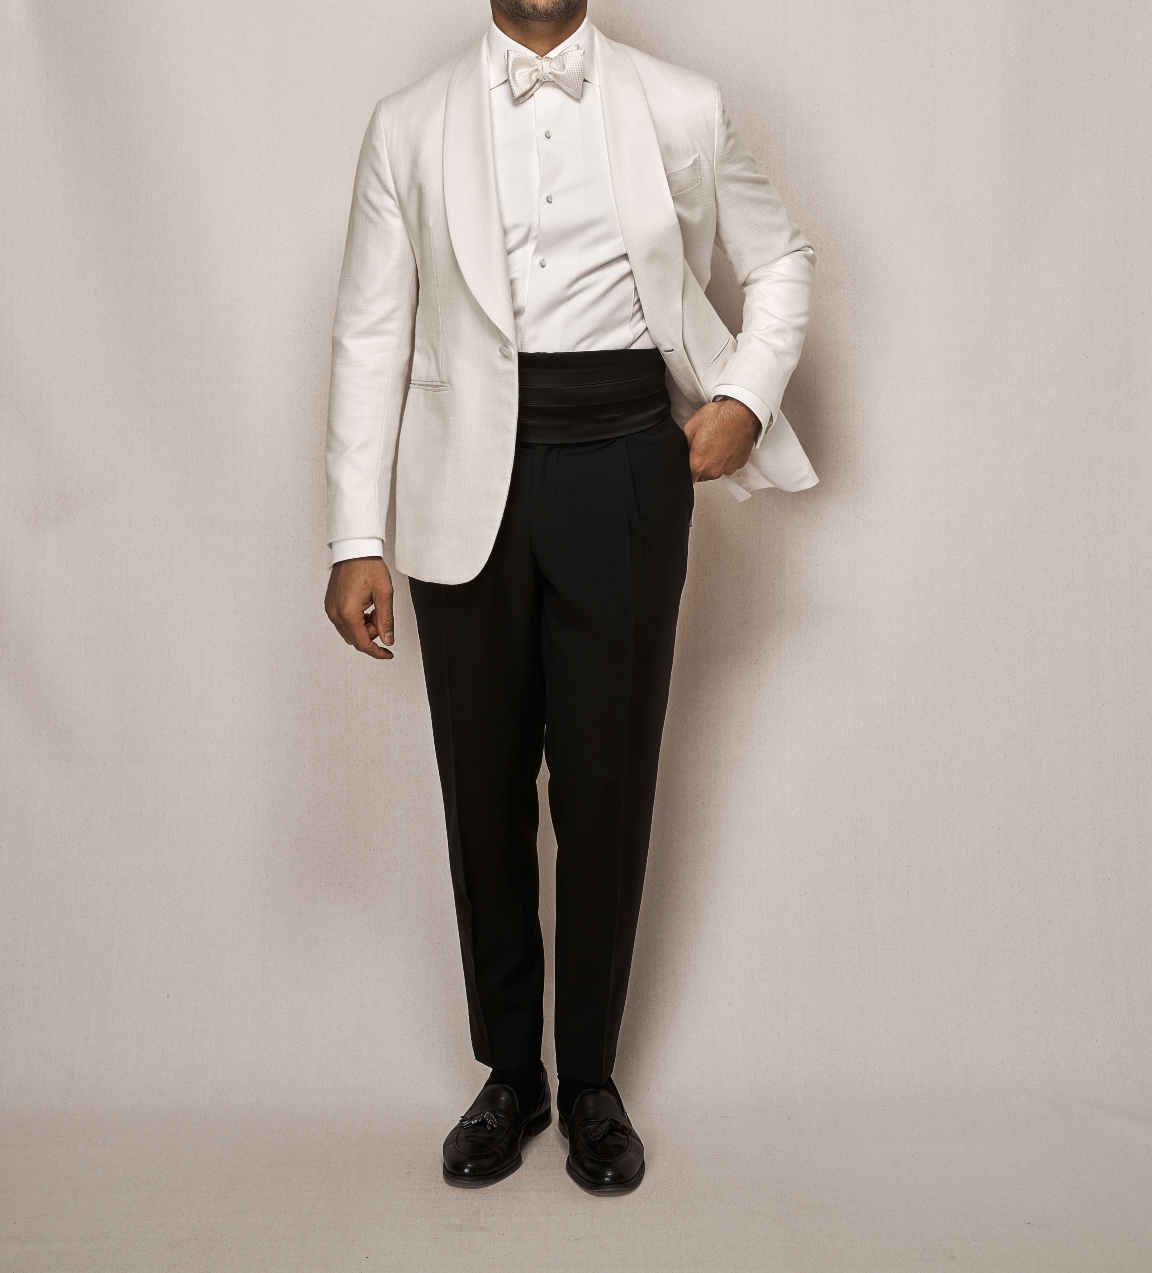 Man modelling classic all white tailor made tuxedo